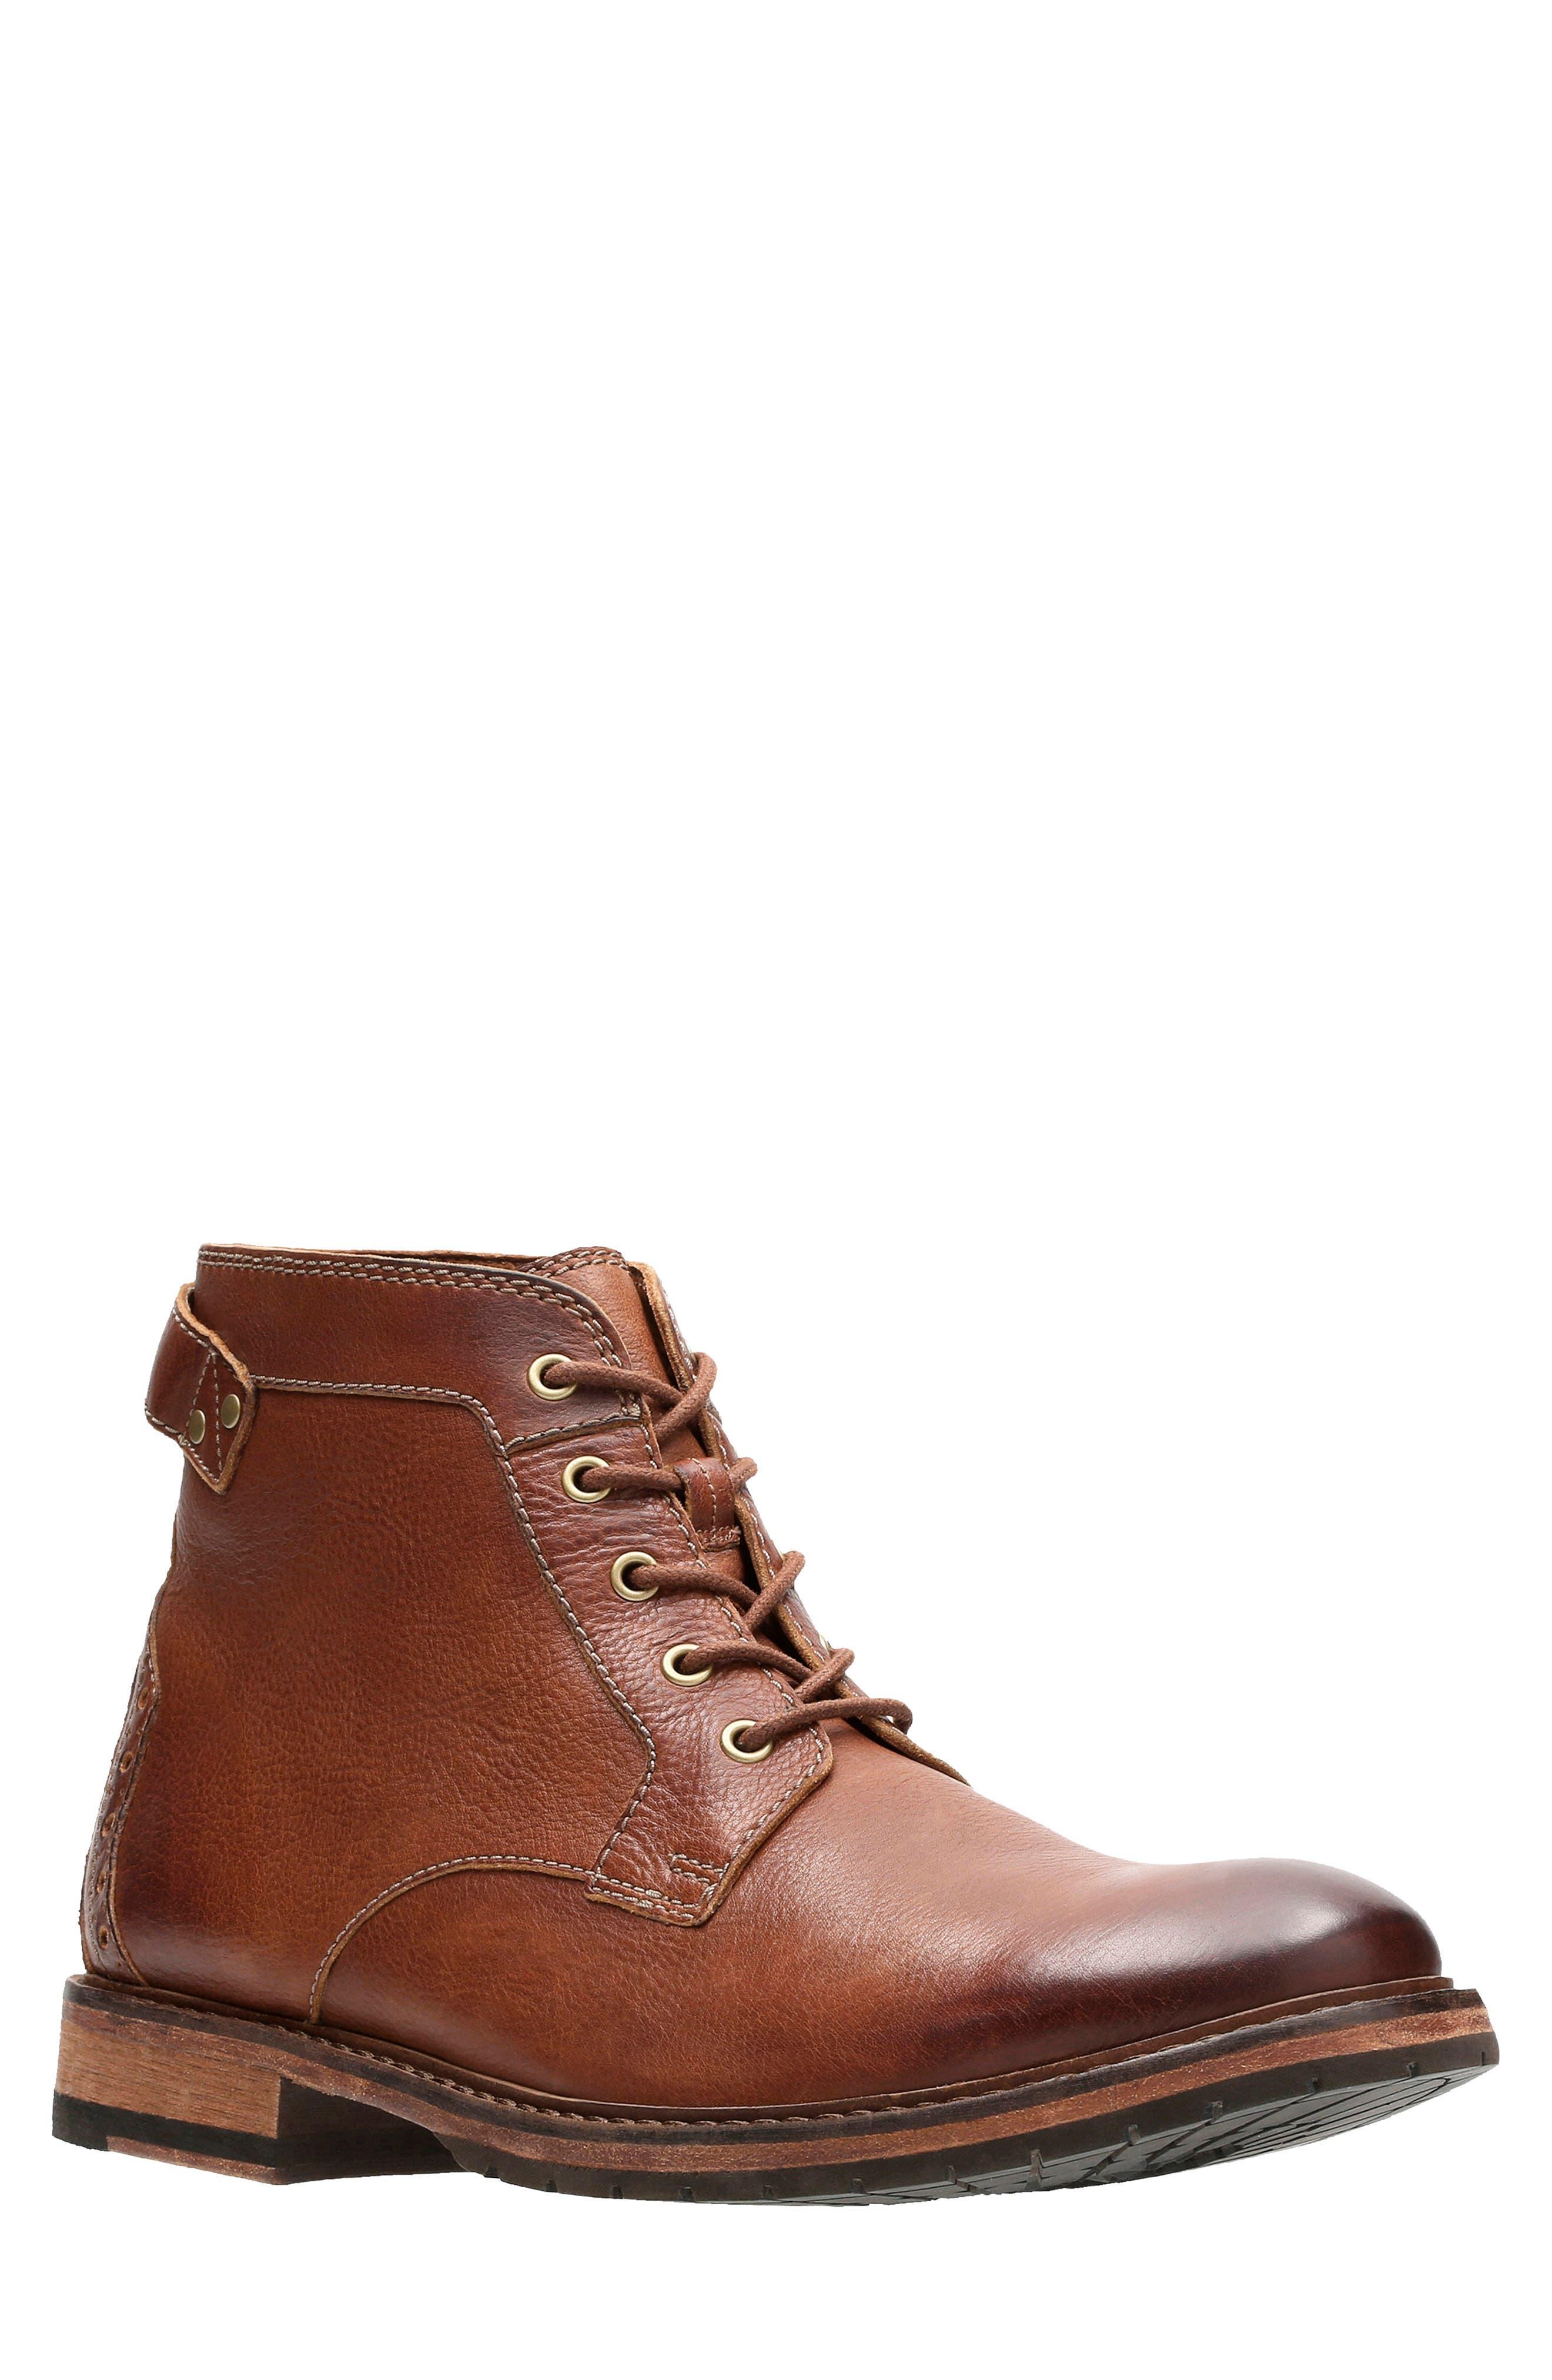 Clarkdale Bud Plain Toe Boot,                         Main,                         color, DARK TAN LEATHER